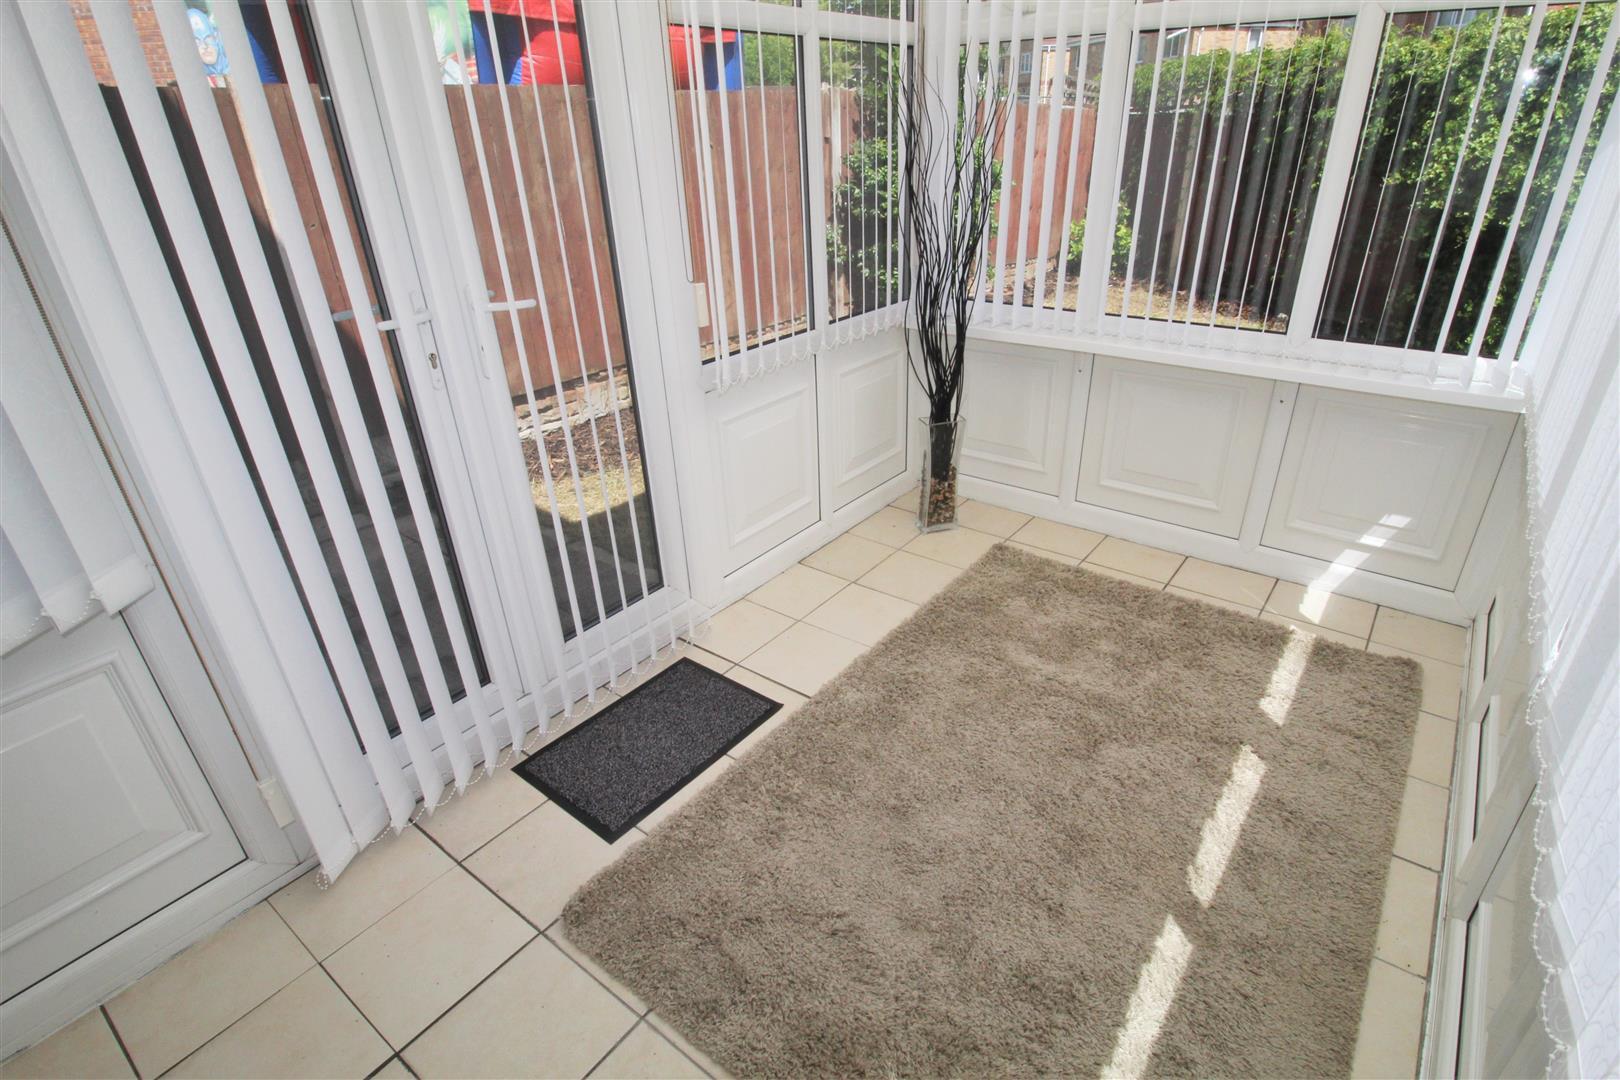 3 Bedrooms, House - Semi-Detached, Riviera Drive, Liverpool